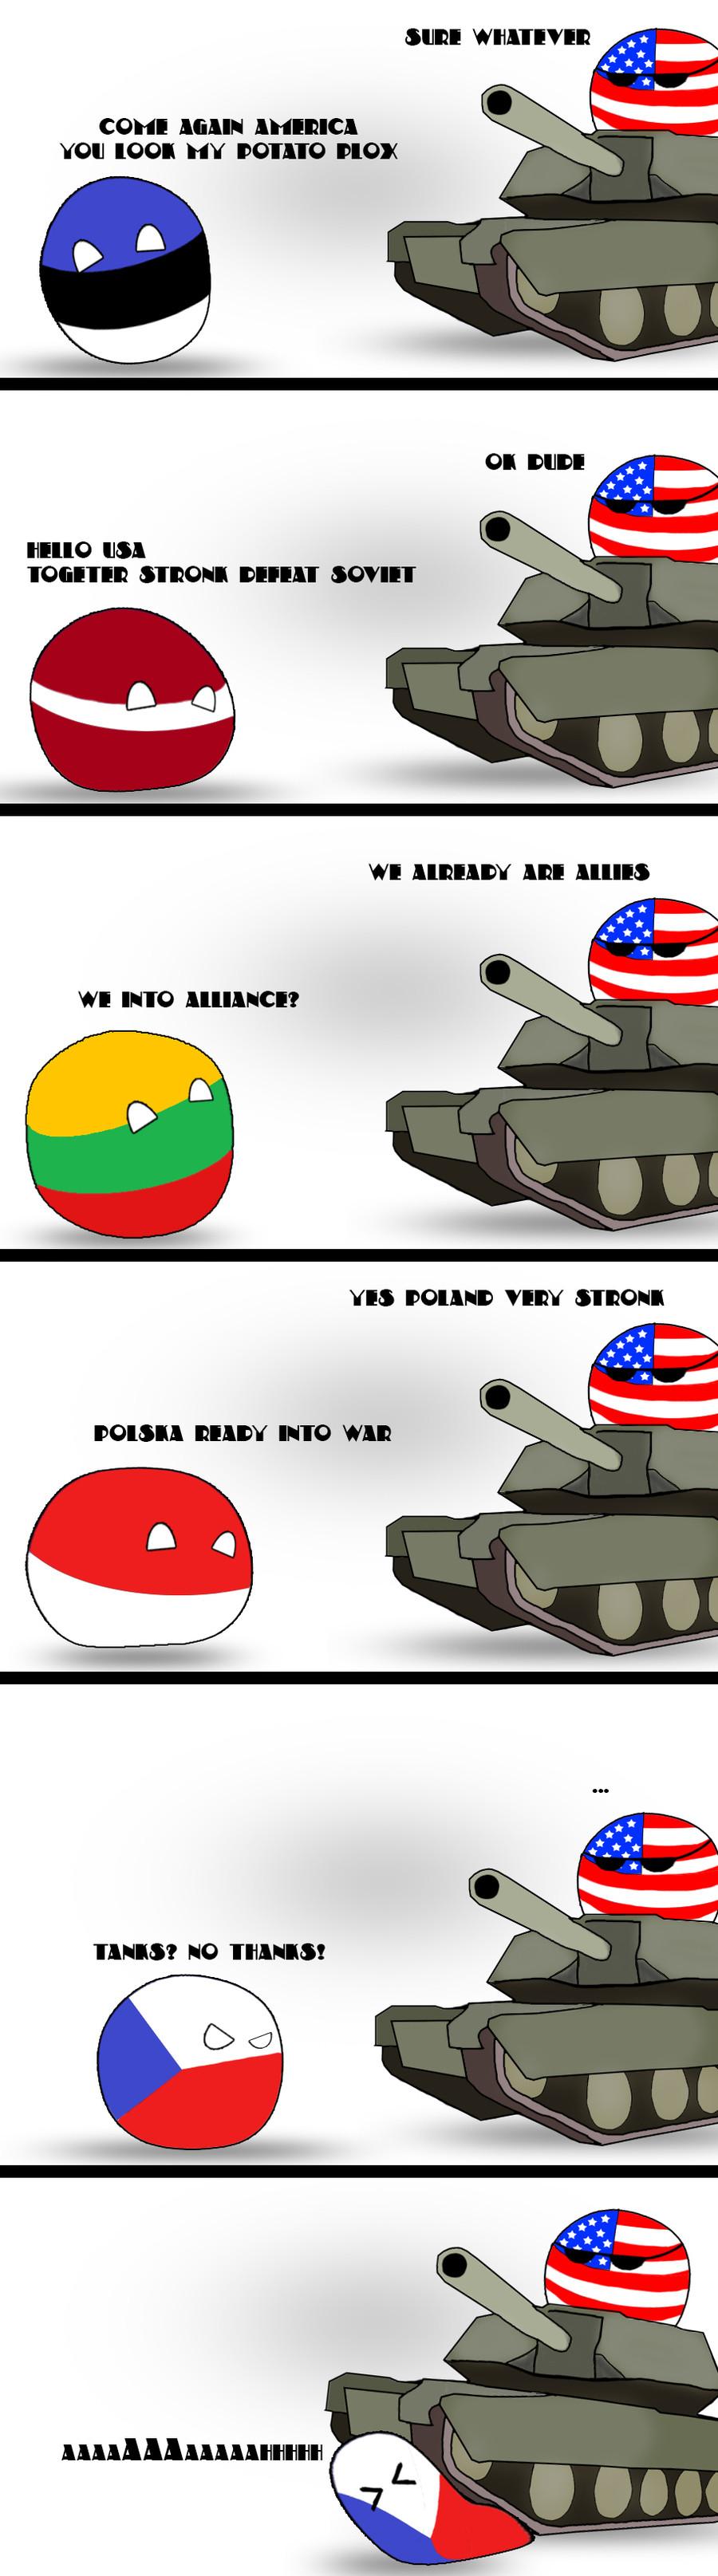 Tanks? NO thanks!. . SID! WIKA' I' IVIE! COM! AGAIN YOU IUOI HY POTATO DIOR IDA WI MIC ! aall DOIPPA READY MID WAR NO THANKS!. I love Americas smug aura